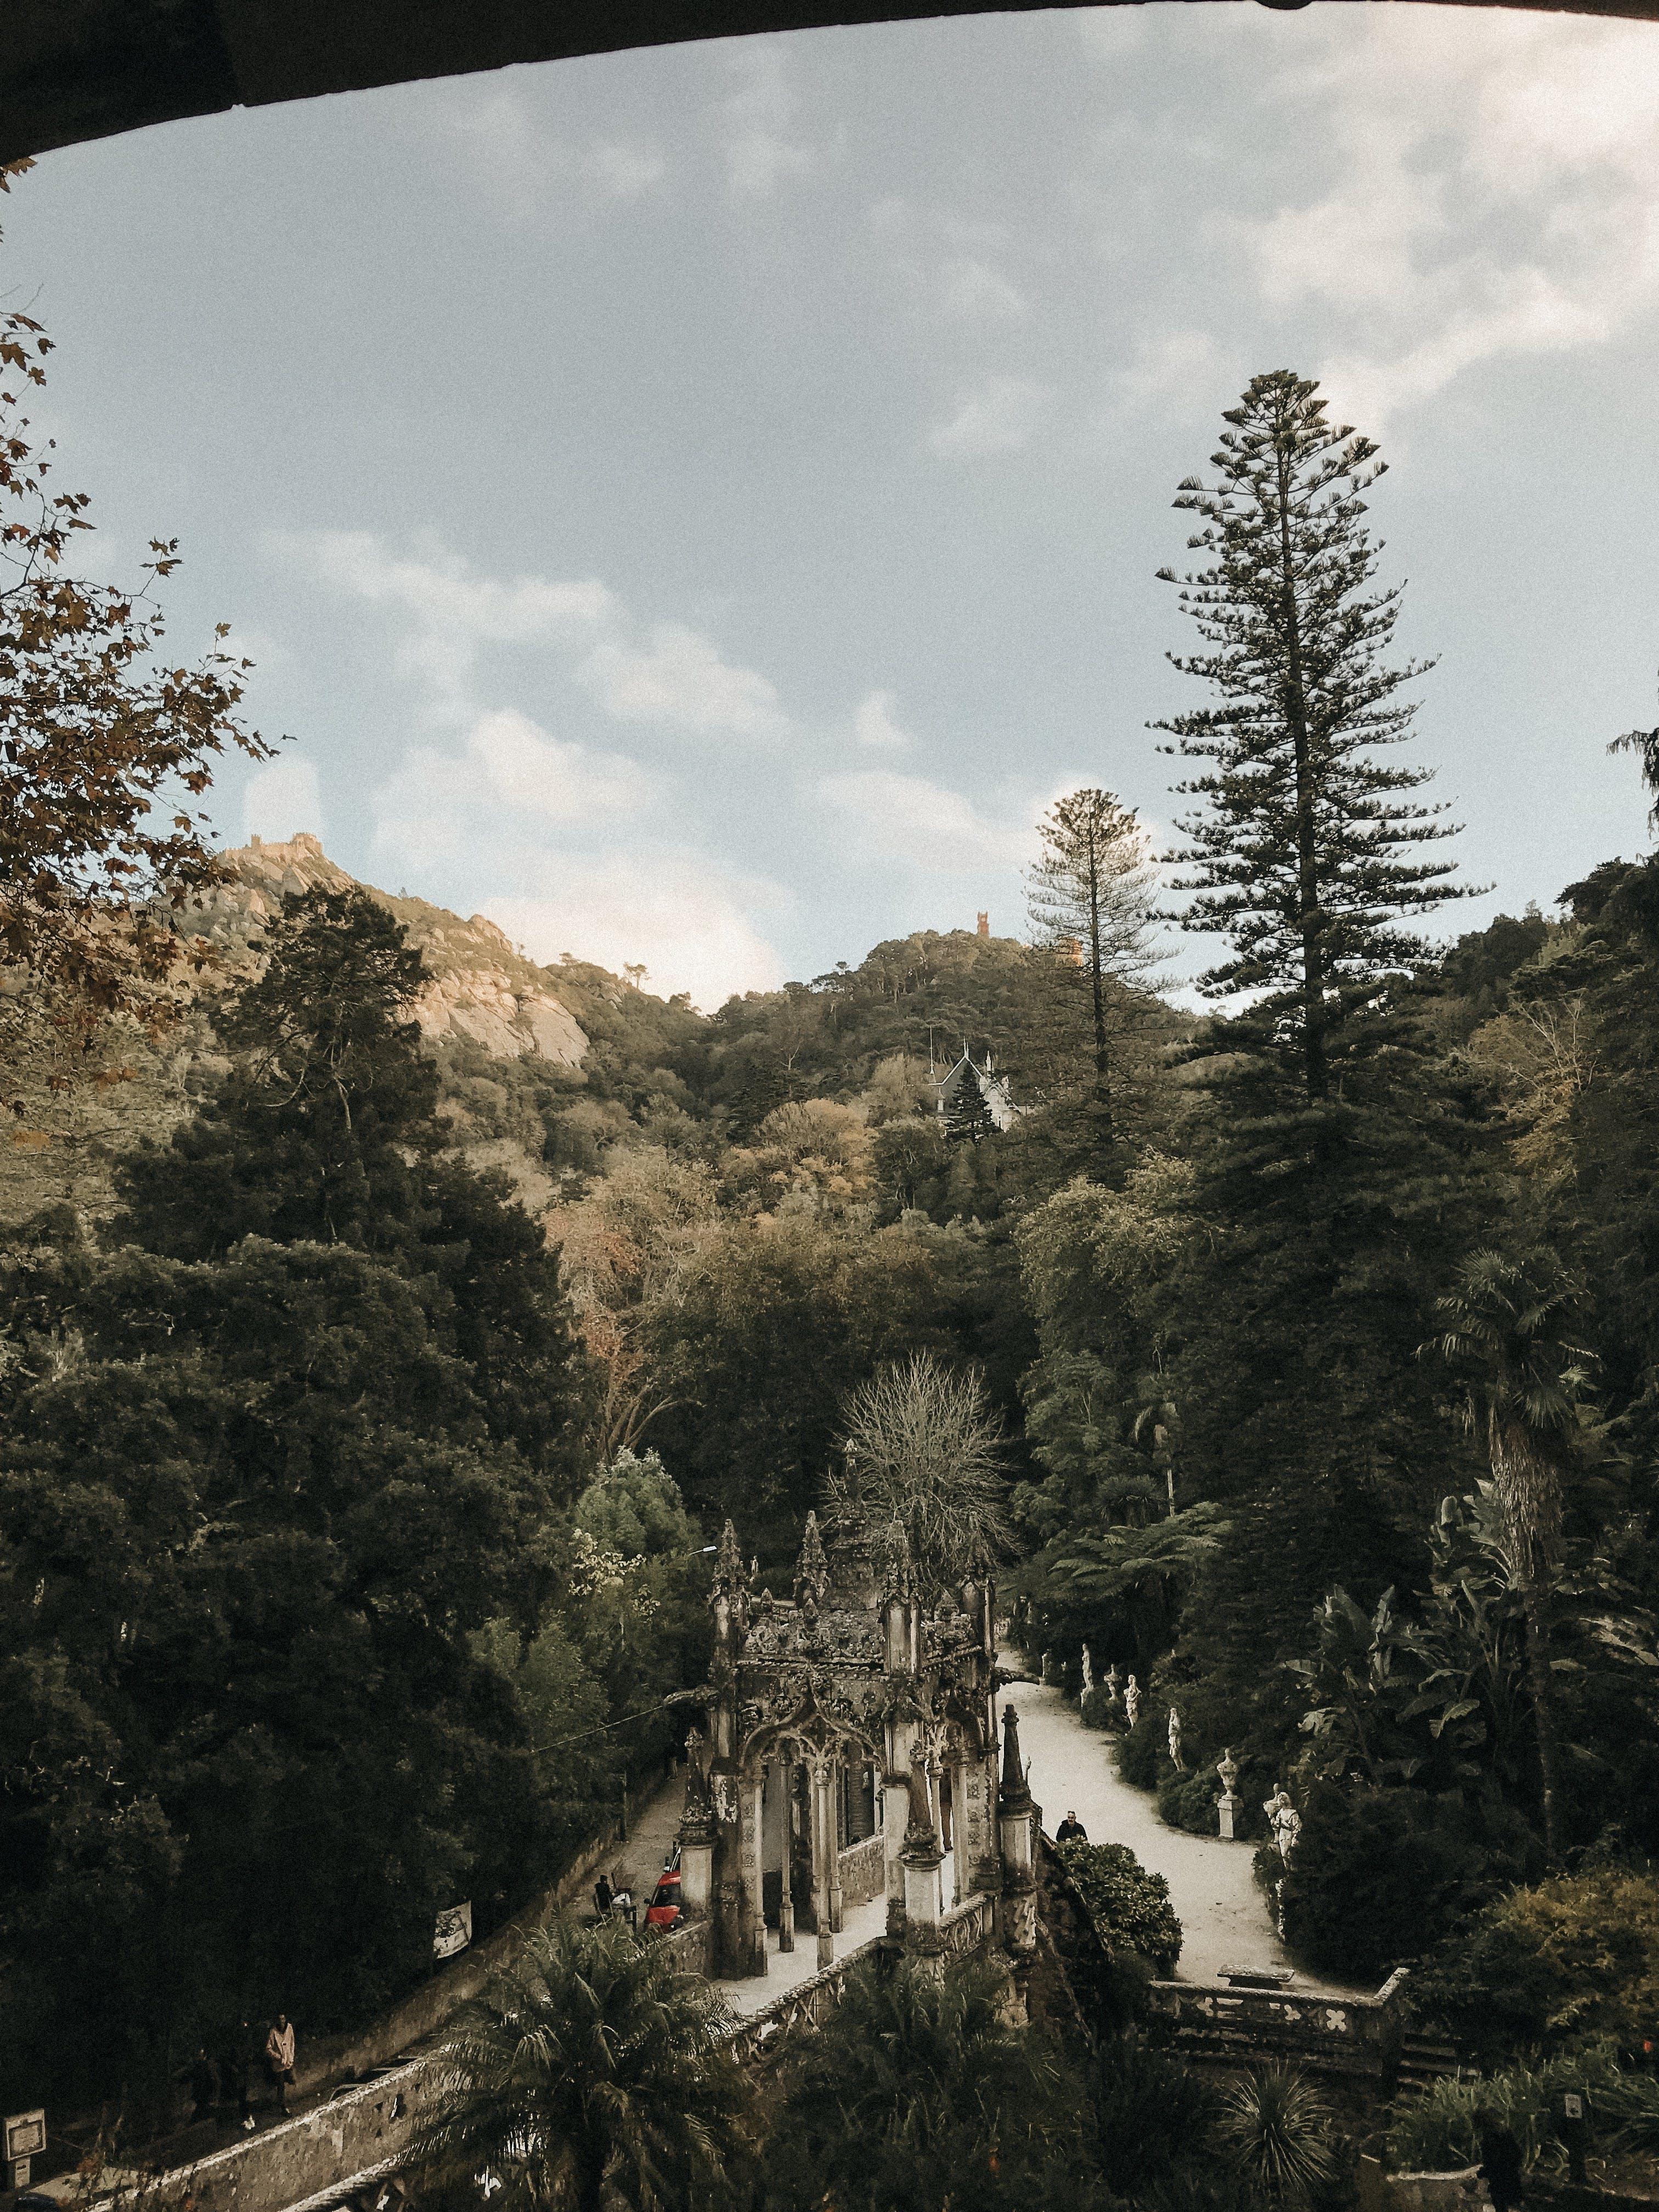 Kostenloses Stock Foto zu abenteuer, bäume, berg, himmel